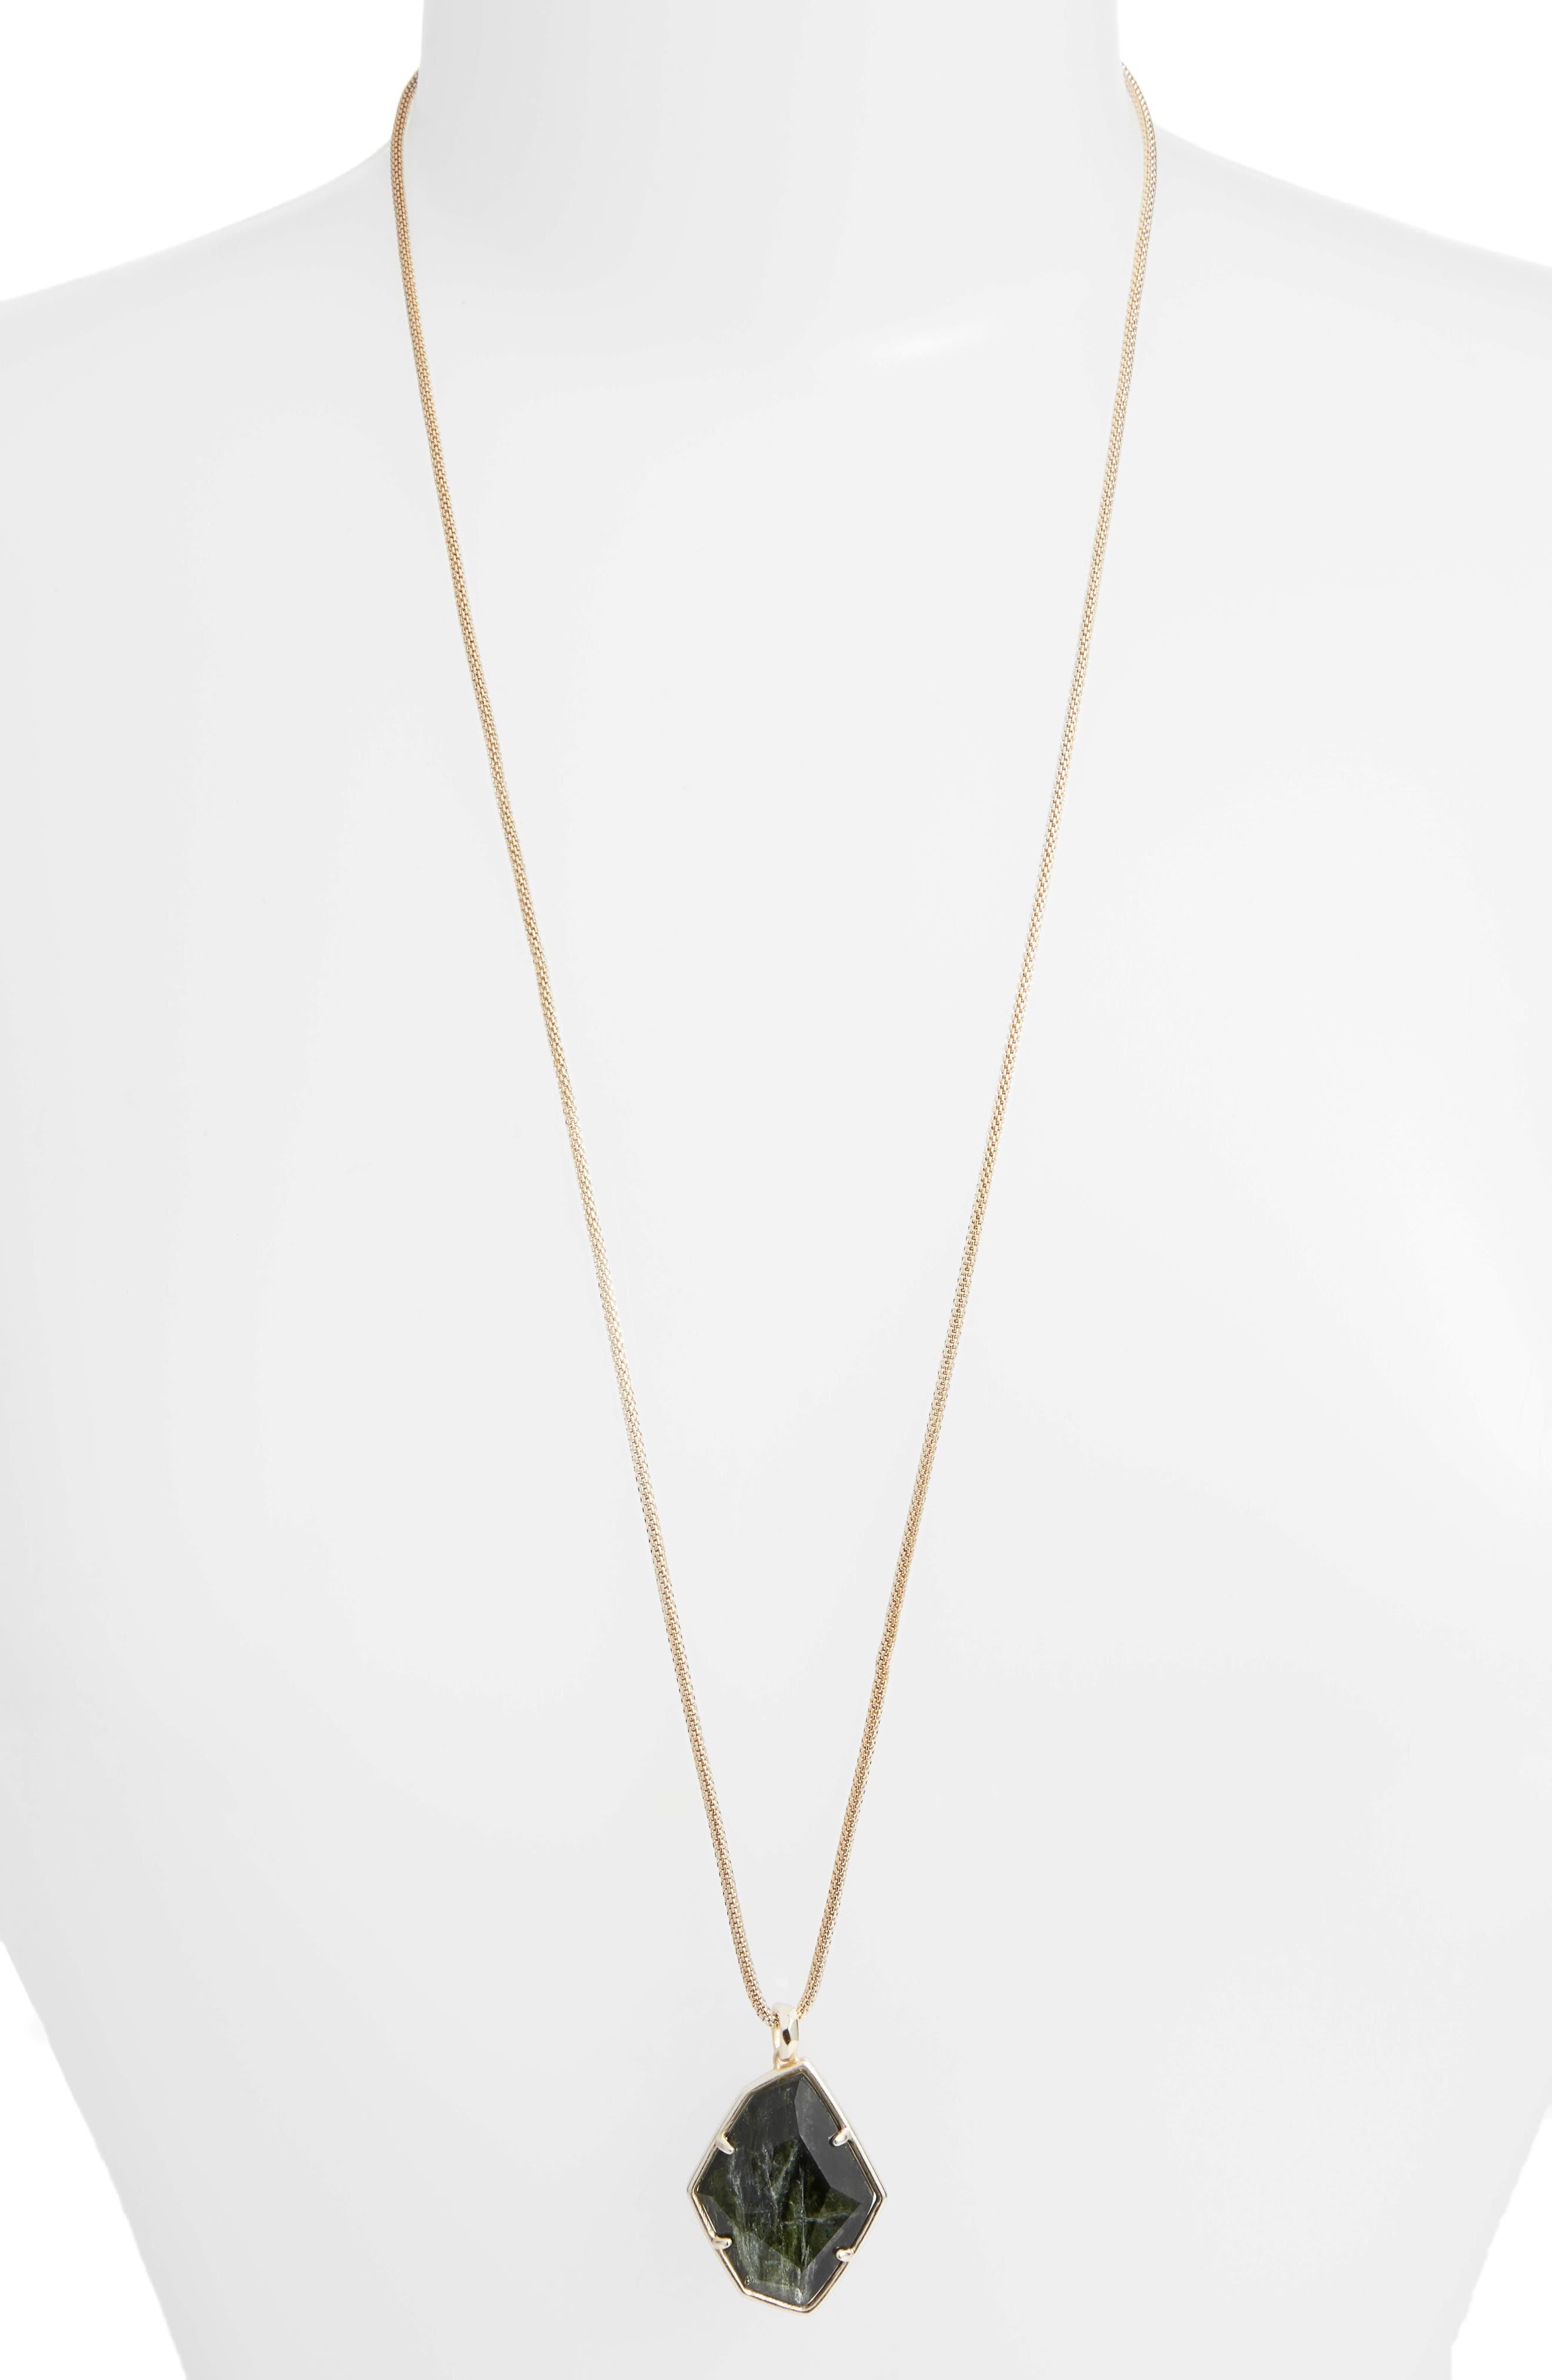 KENDRA SCOTT Kalani Long Adjustable Pendant Necklace in Sage/ Gold